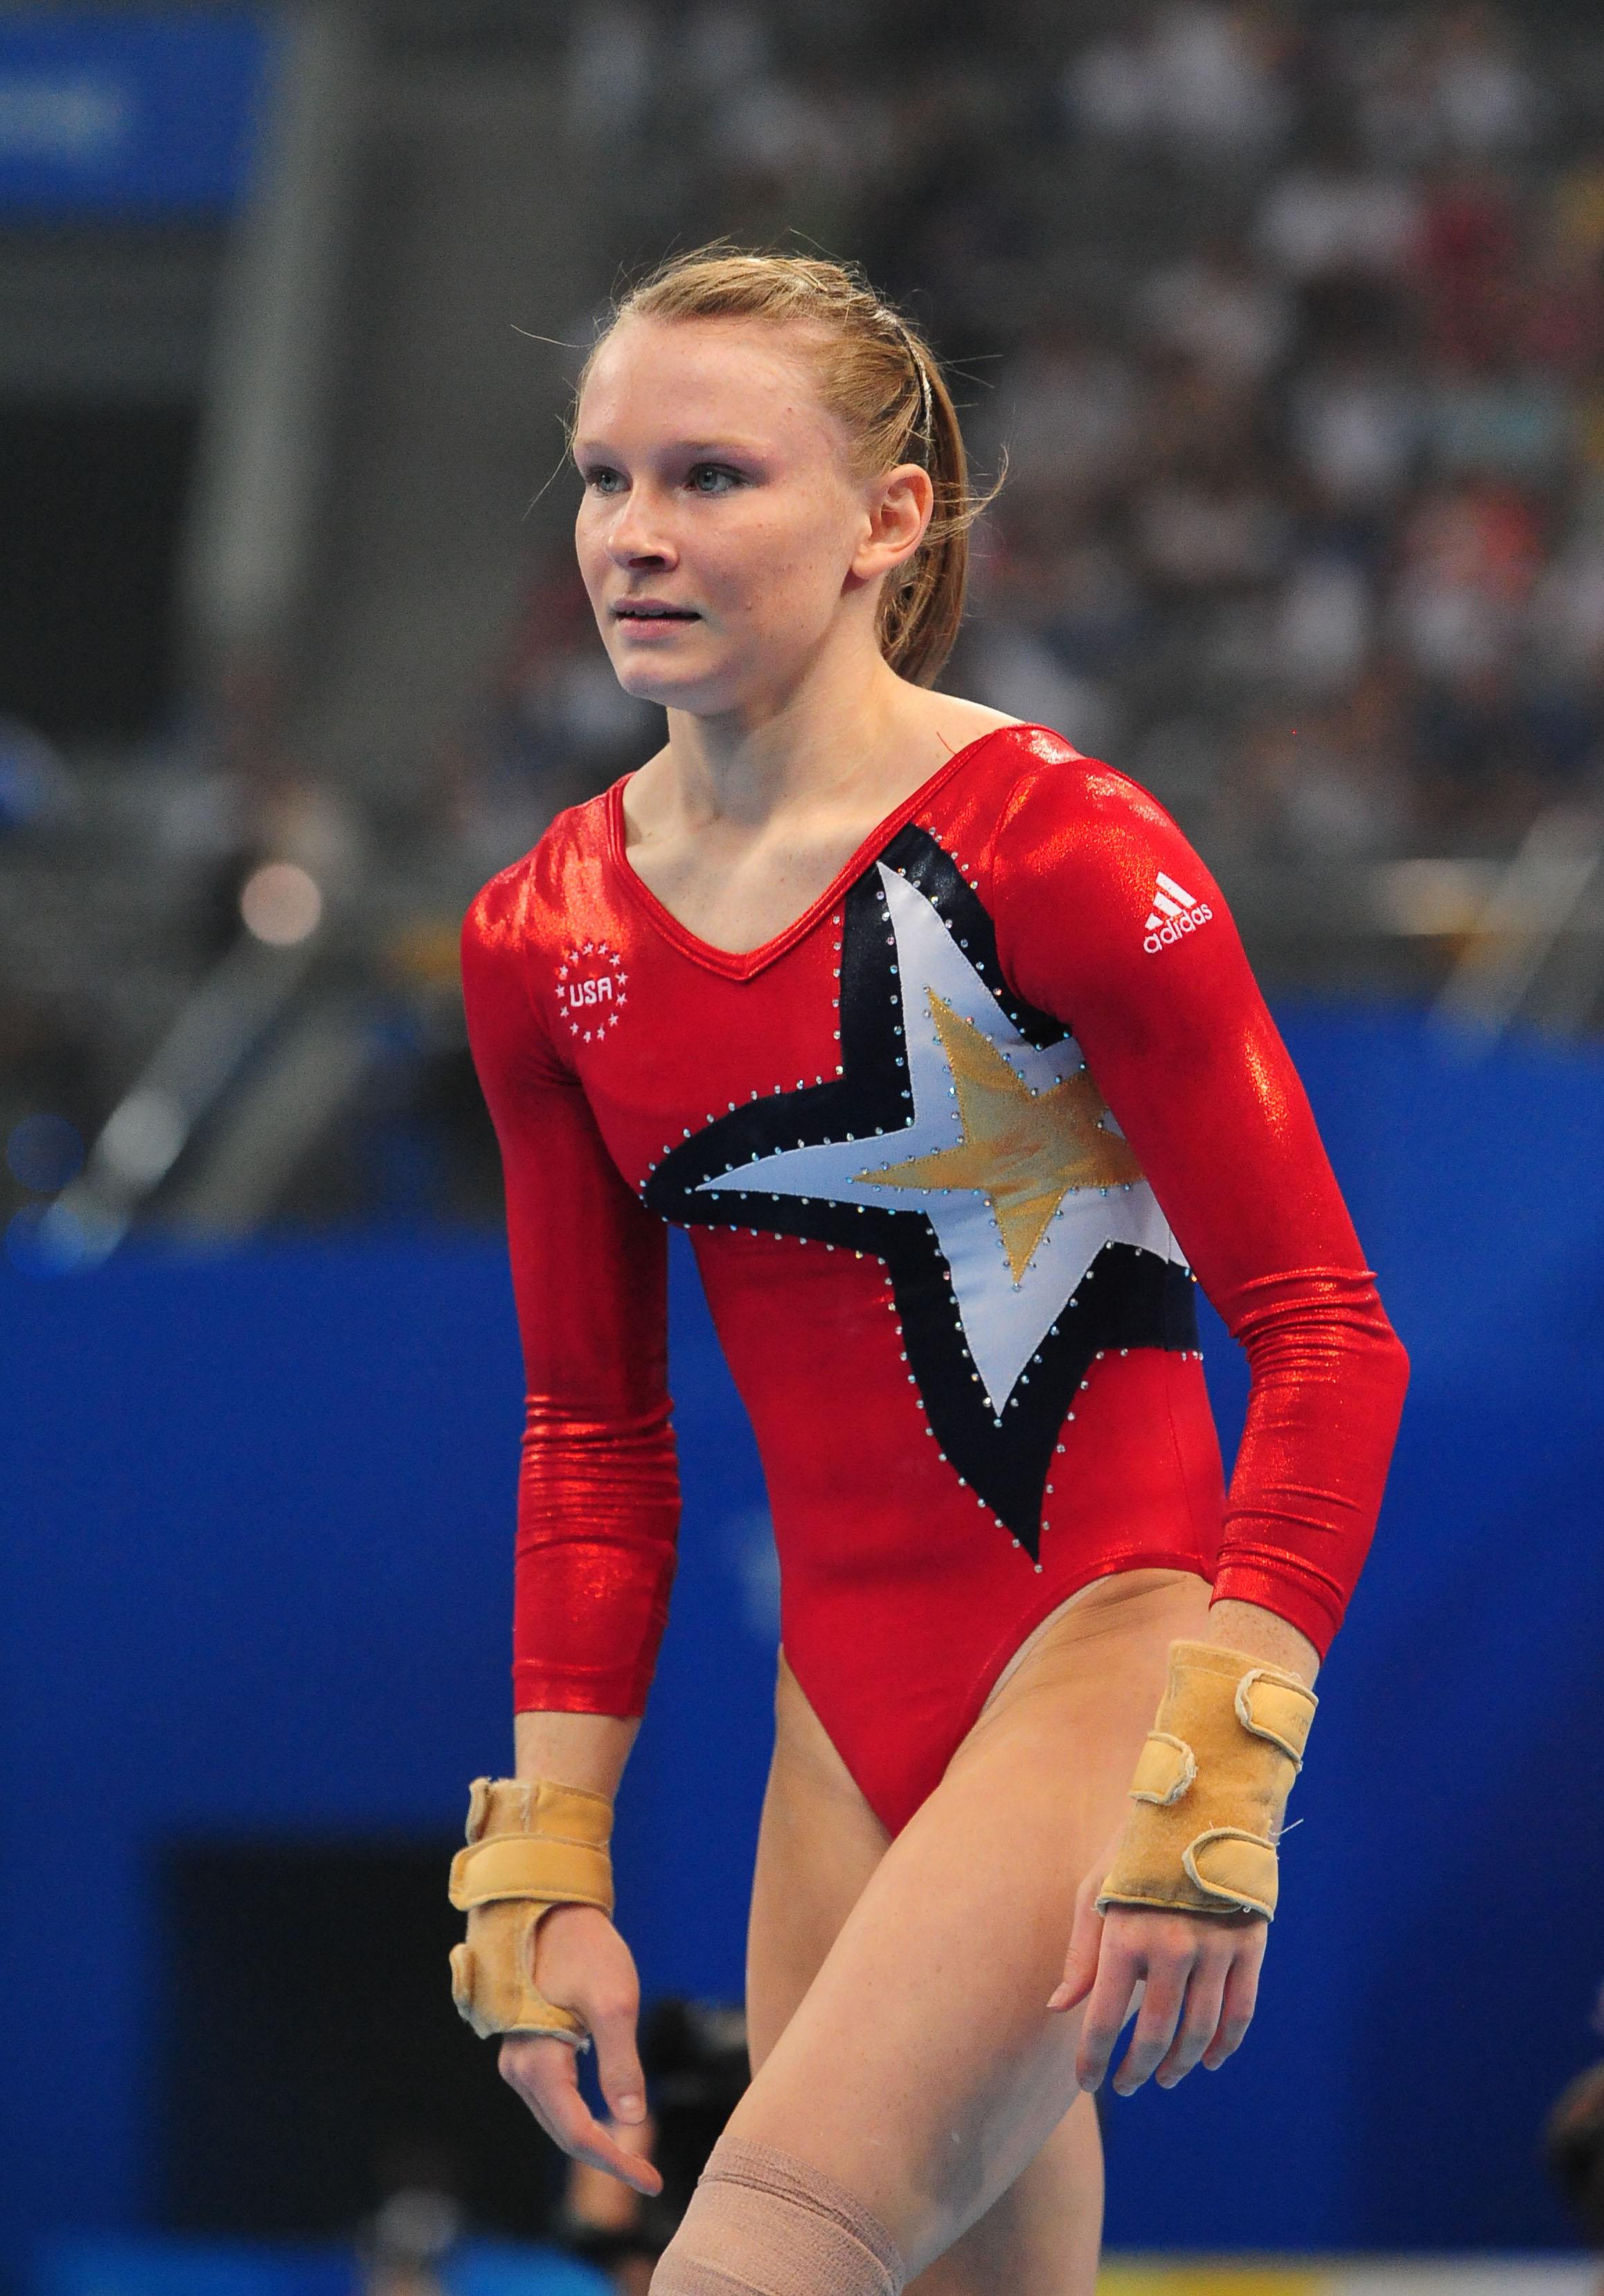 gymnastics global performance testing - HD2316×3315